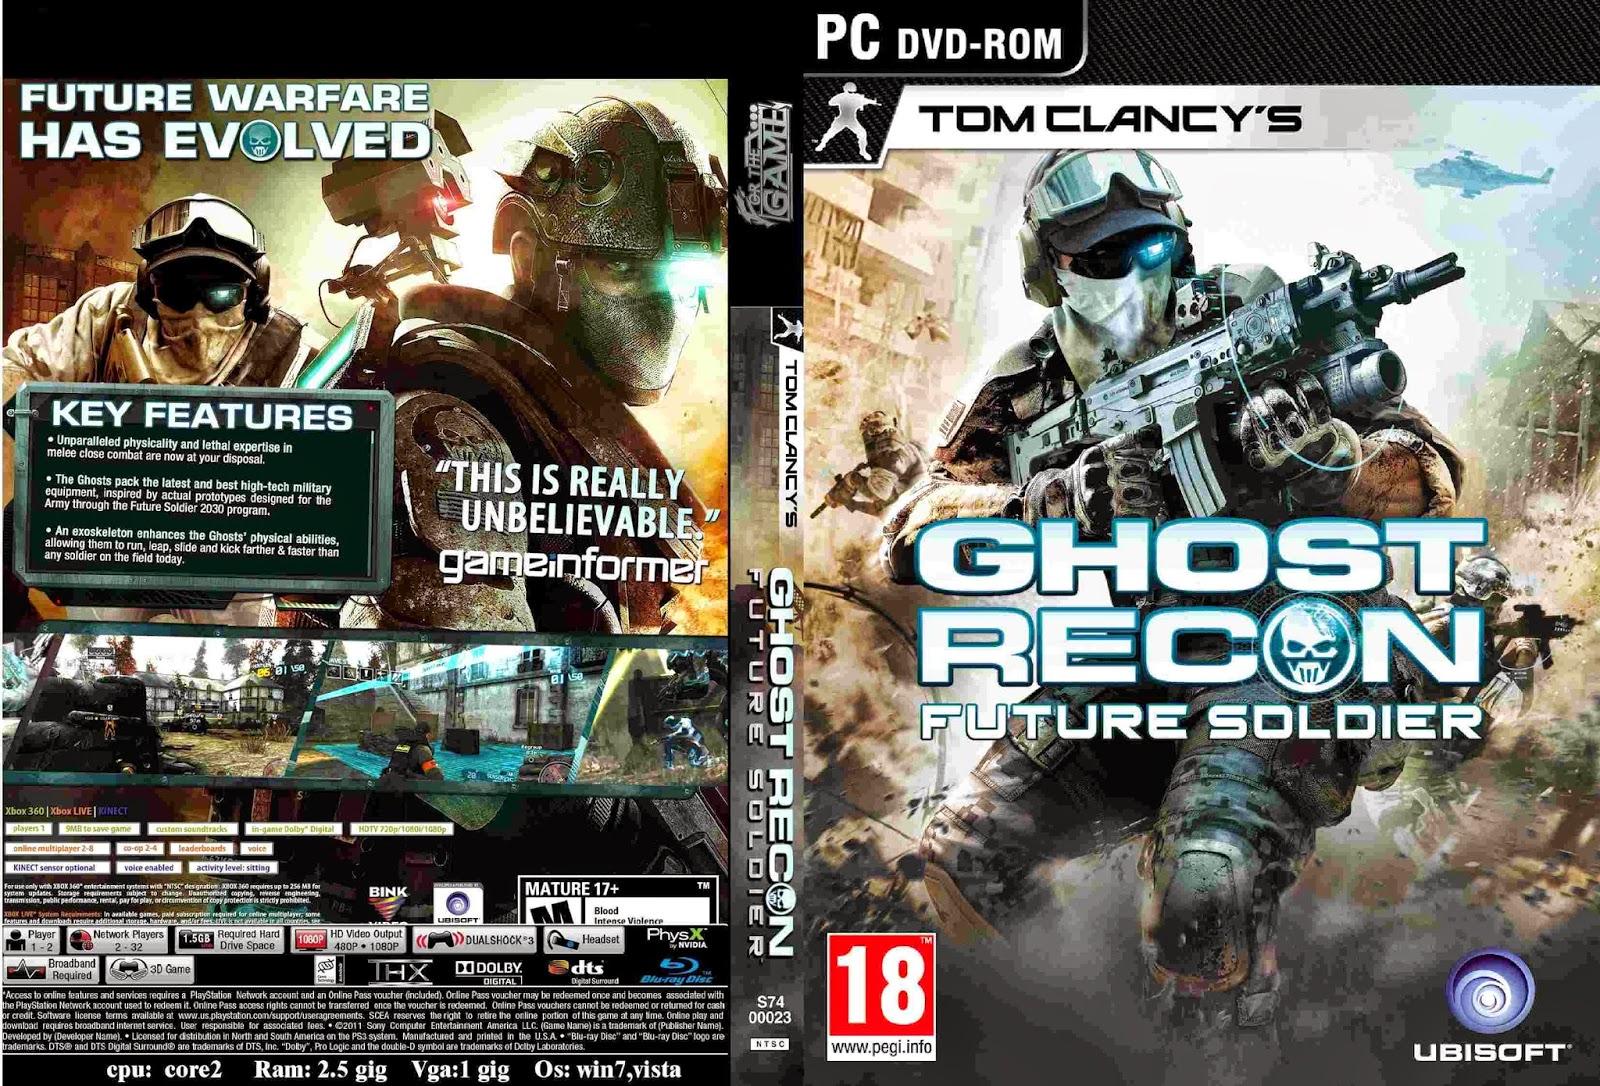 تحميل لعبة ghost recon future soldier برابط مباشر